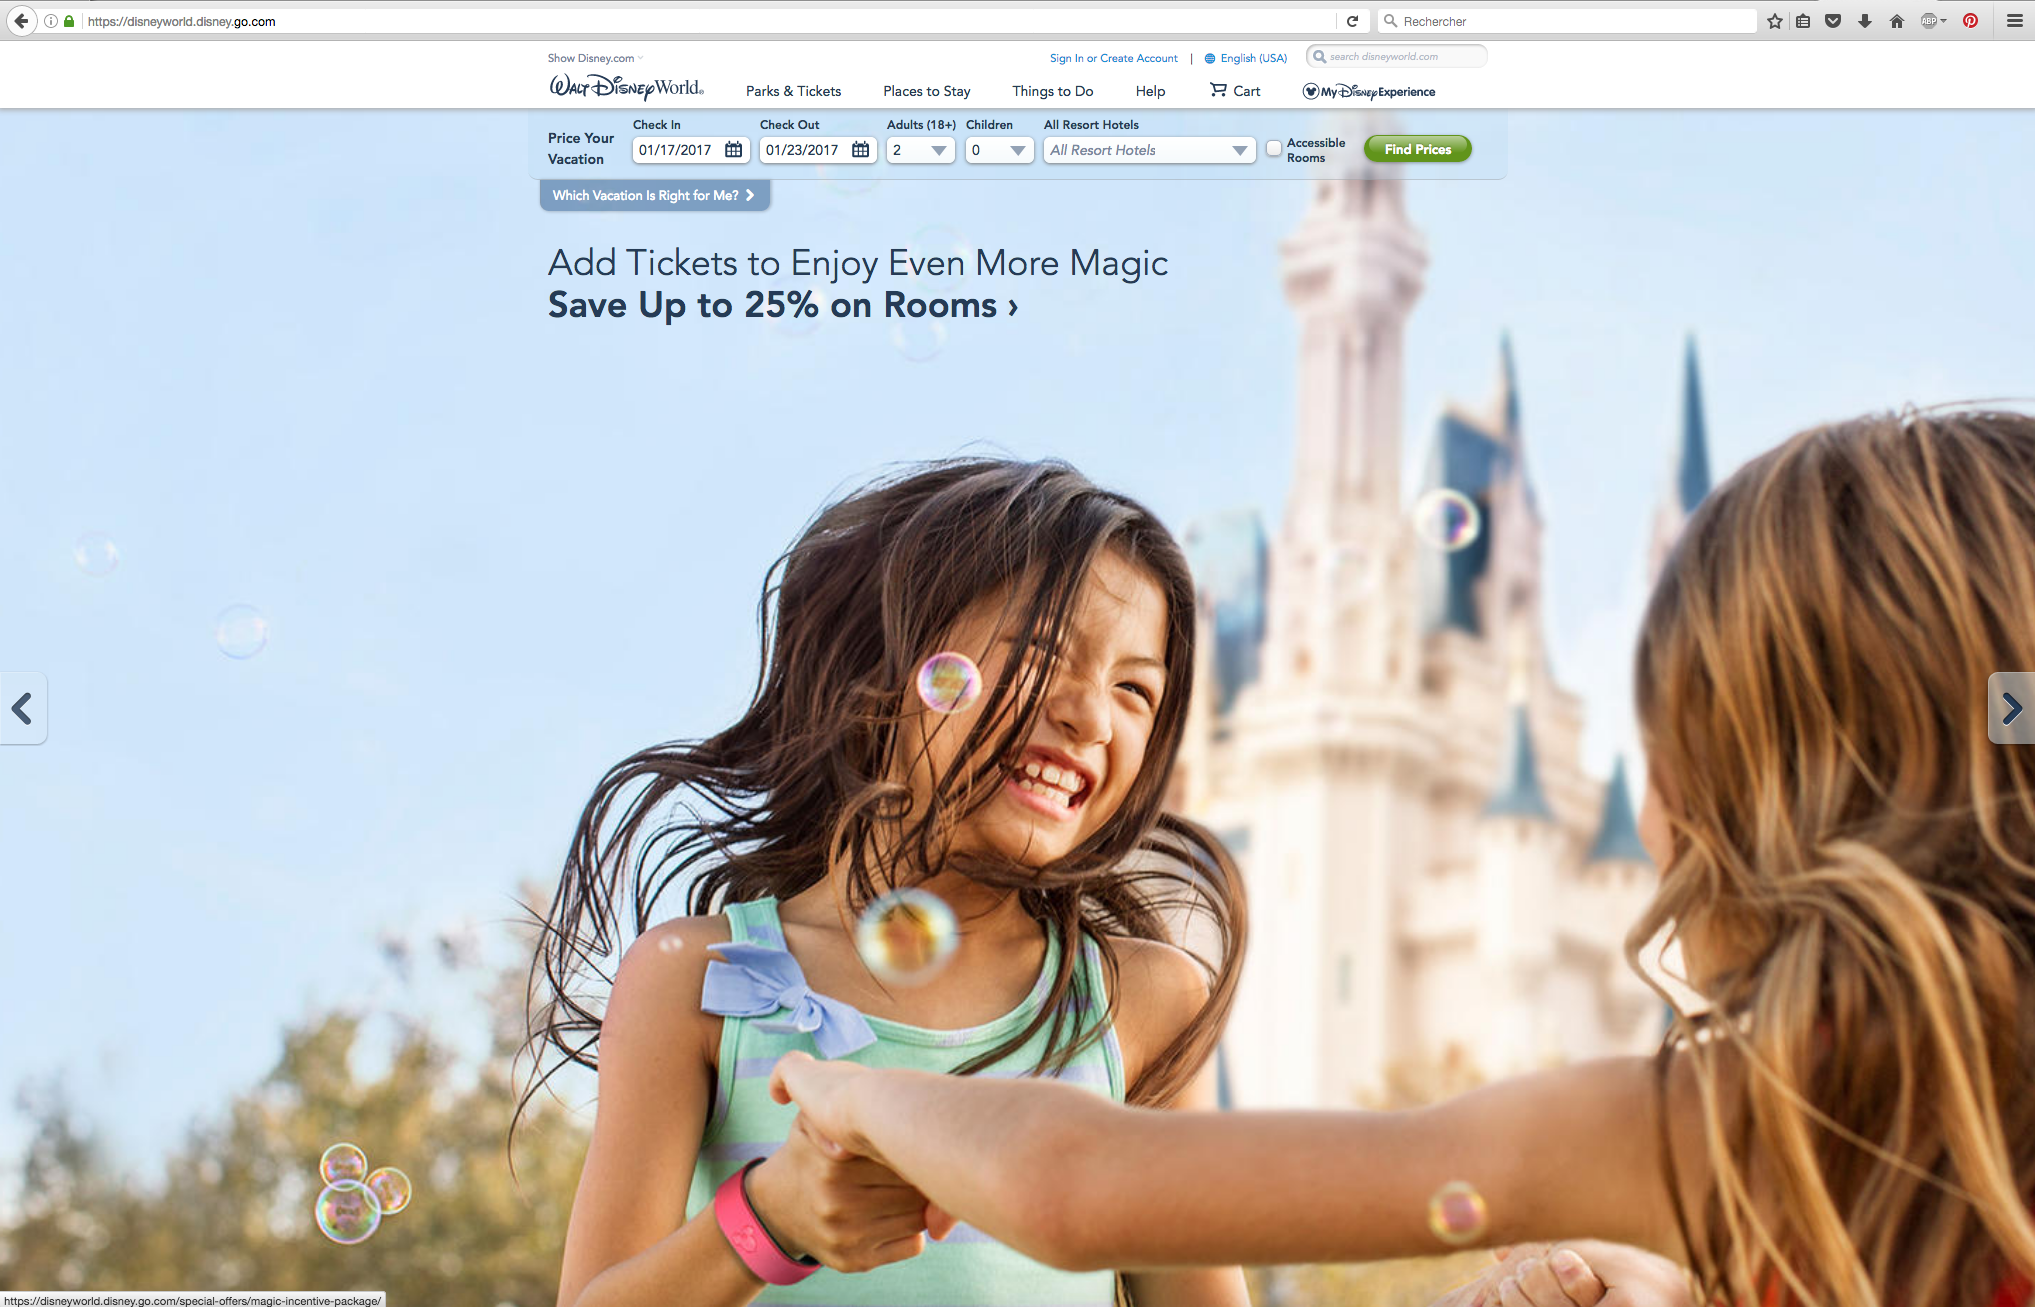 Site US - Walt Disney World